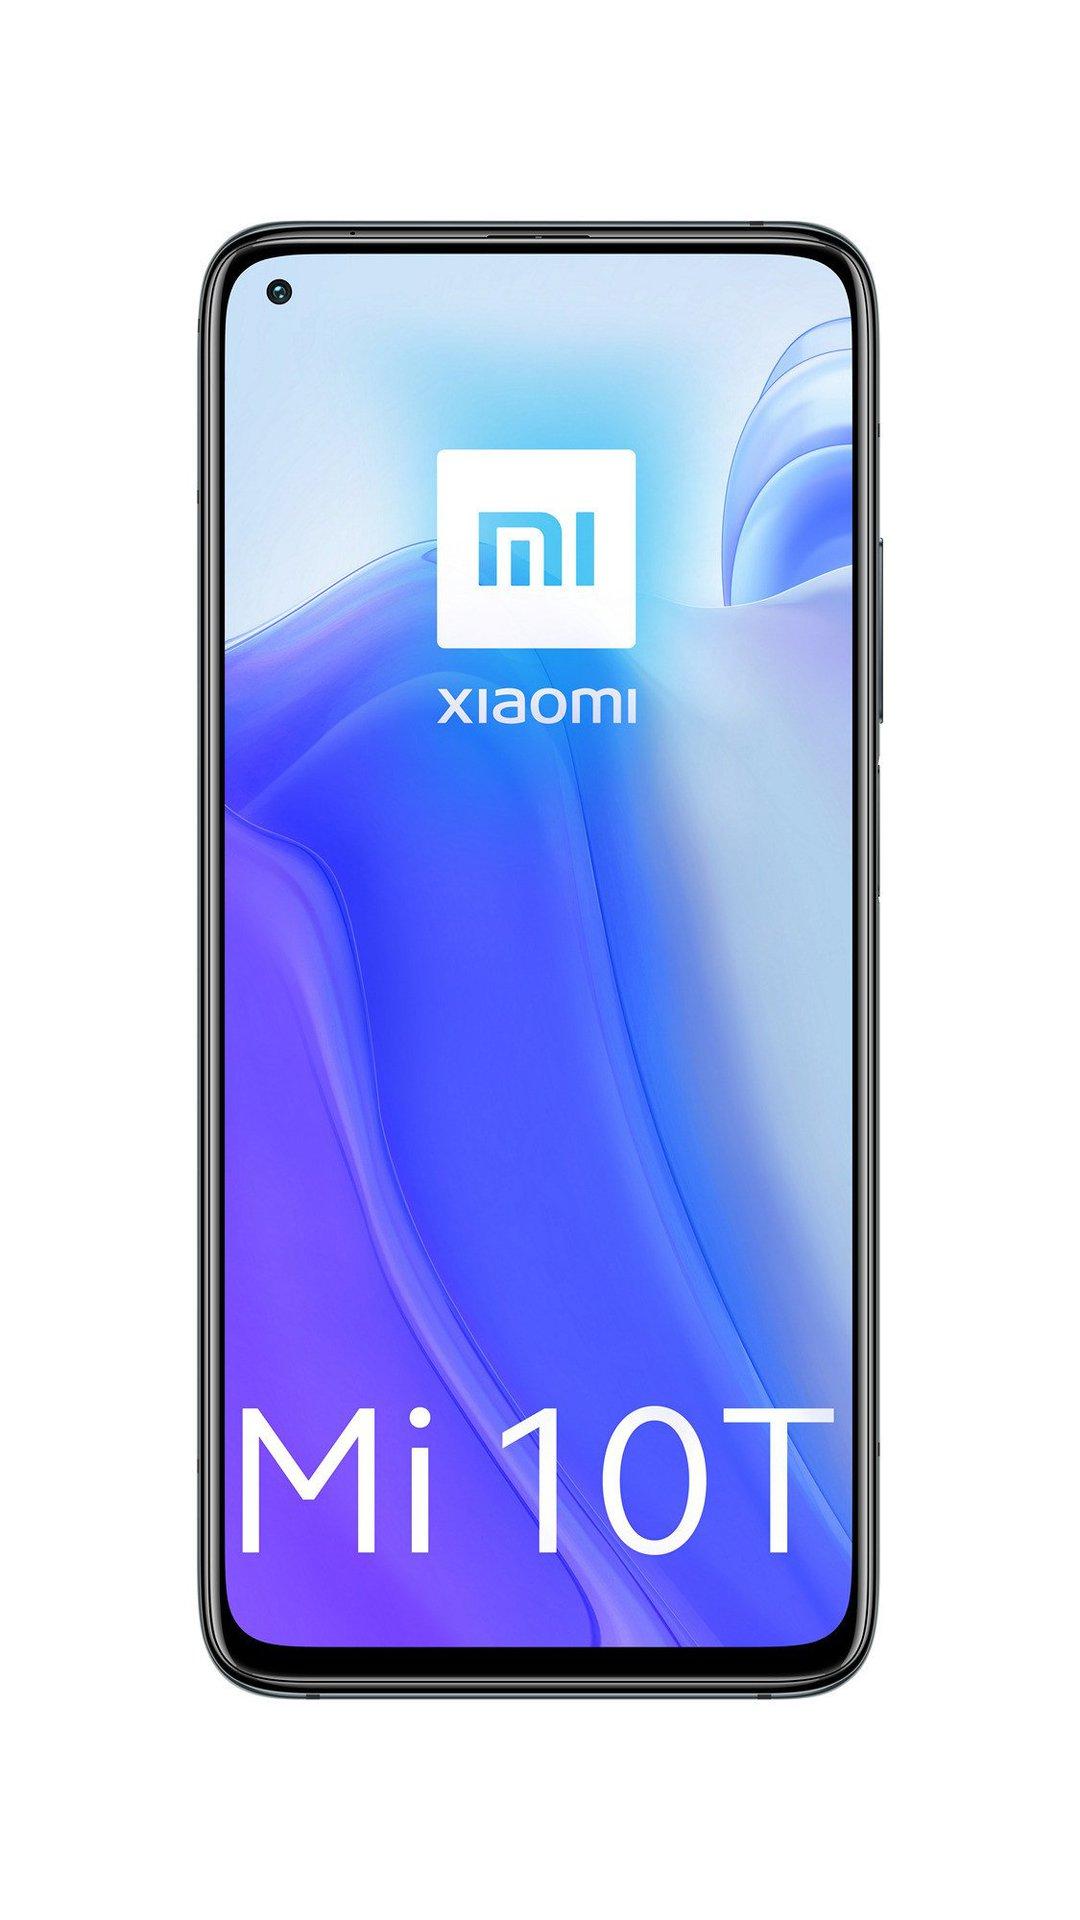 Xiaomi Mi 10T Render leak showing display